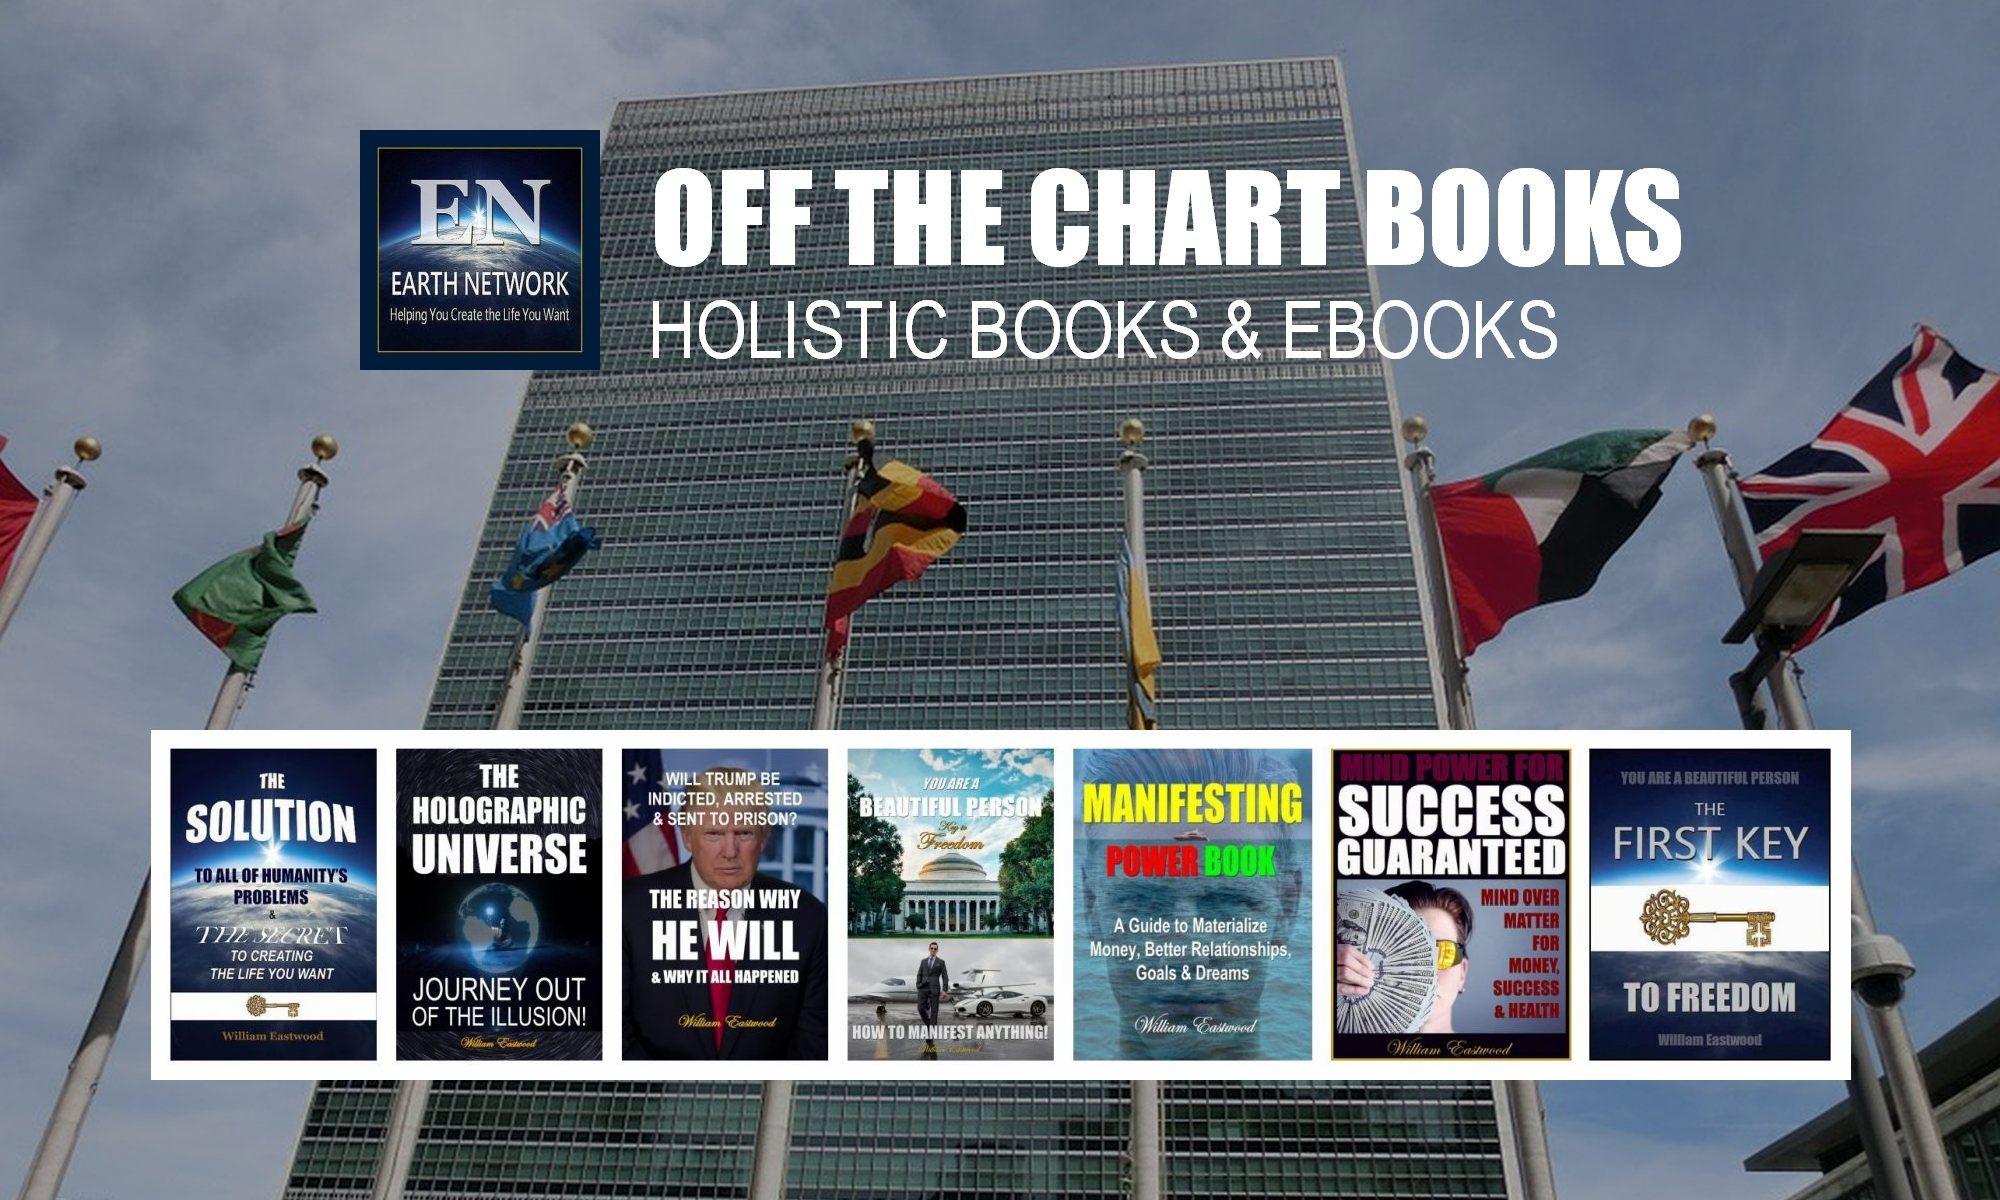 Holistic books & ebooks. Metaphysics & manifesting self-help. Personal growth, body, mind & spirit for EN.